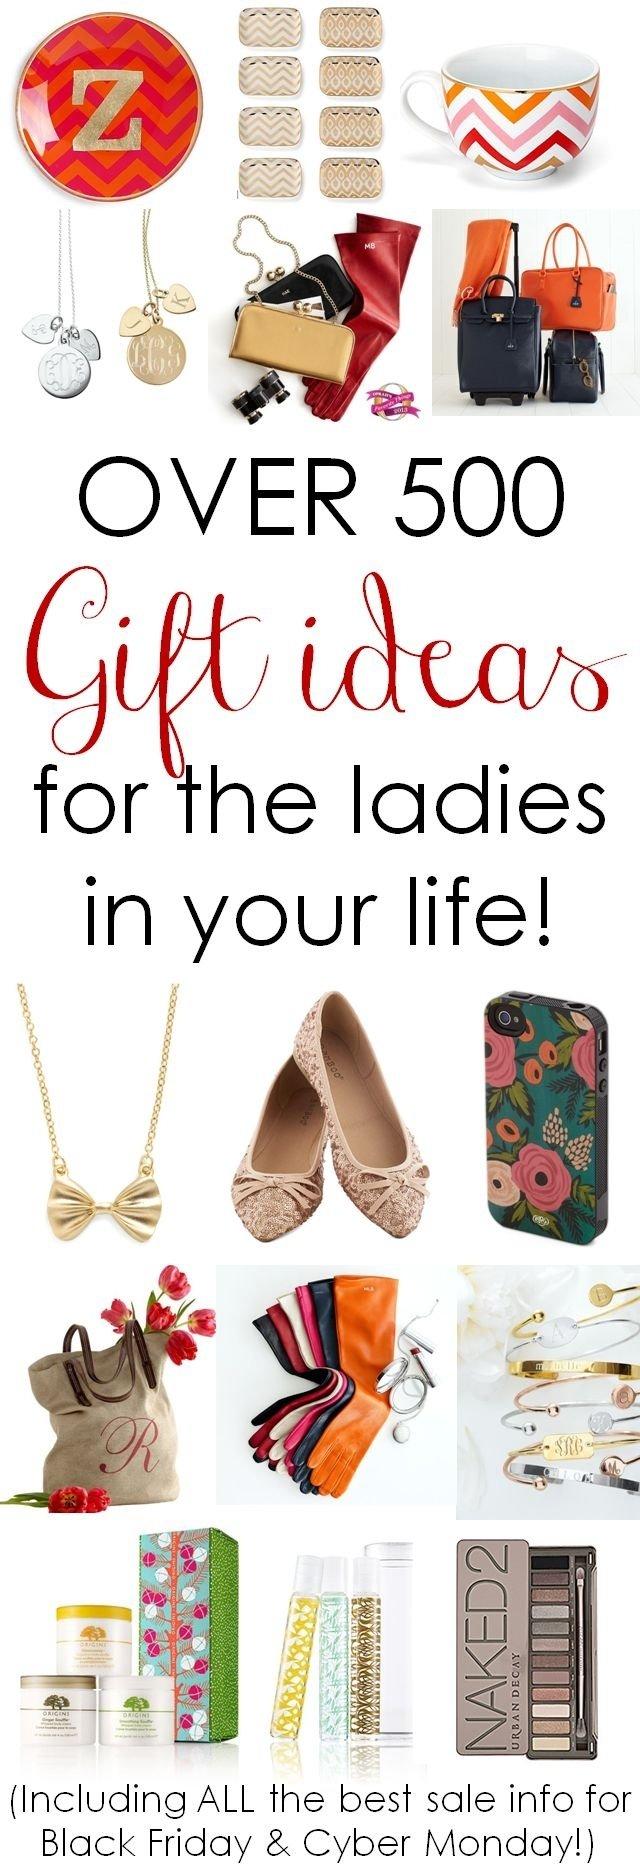 10 Gorgeous Best Christmas Gift Ideas 2013 33 best deals discounts giveaways freebies images on pinterest 1 2021